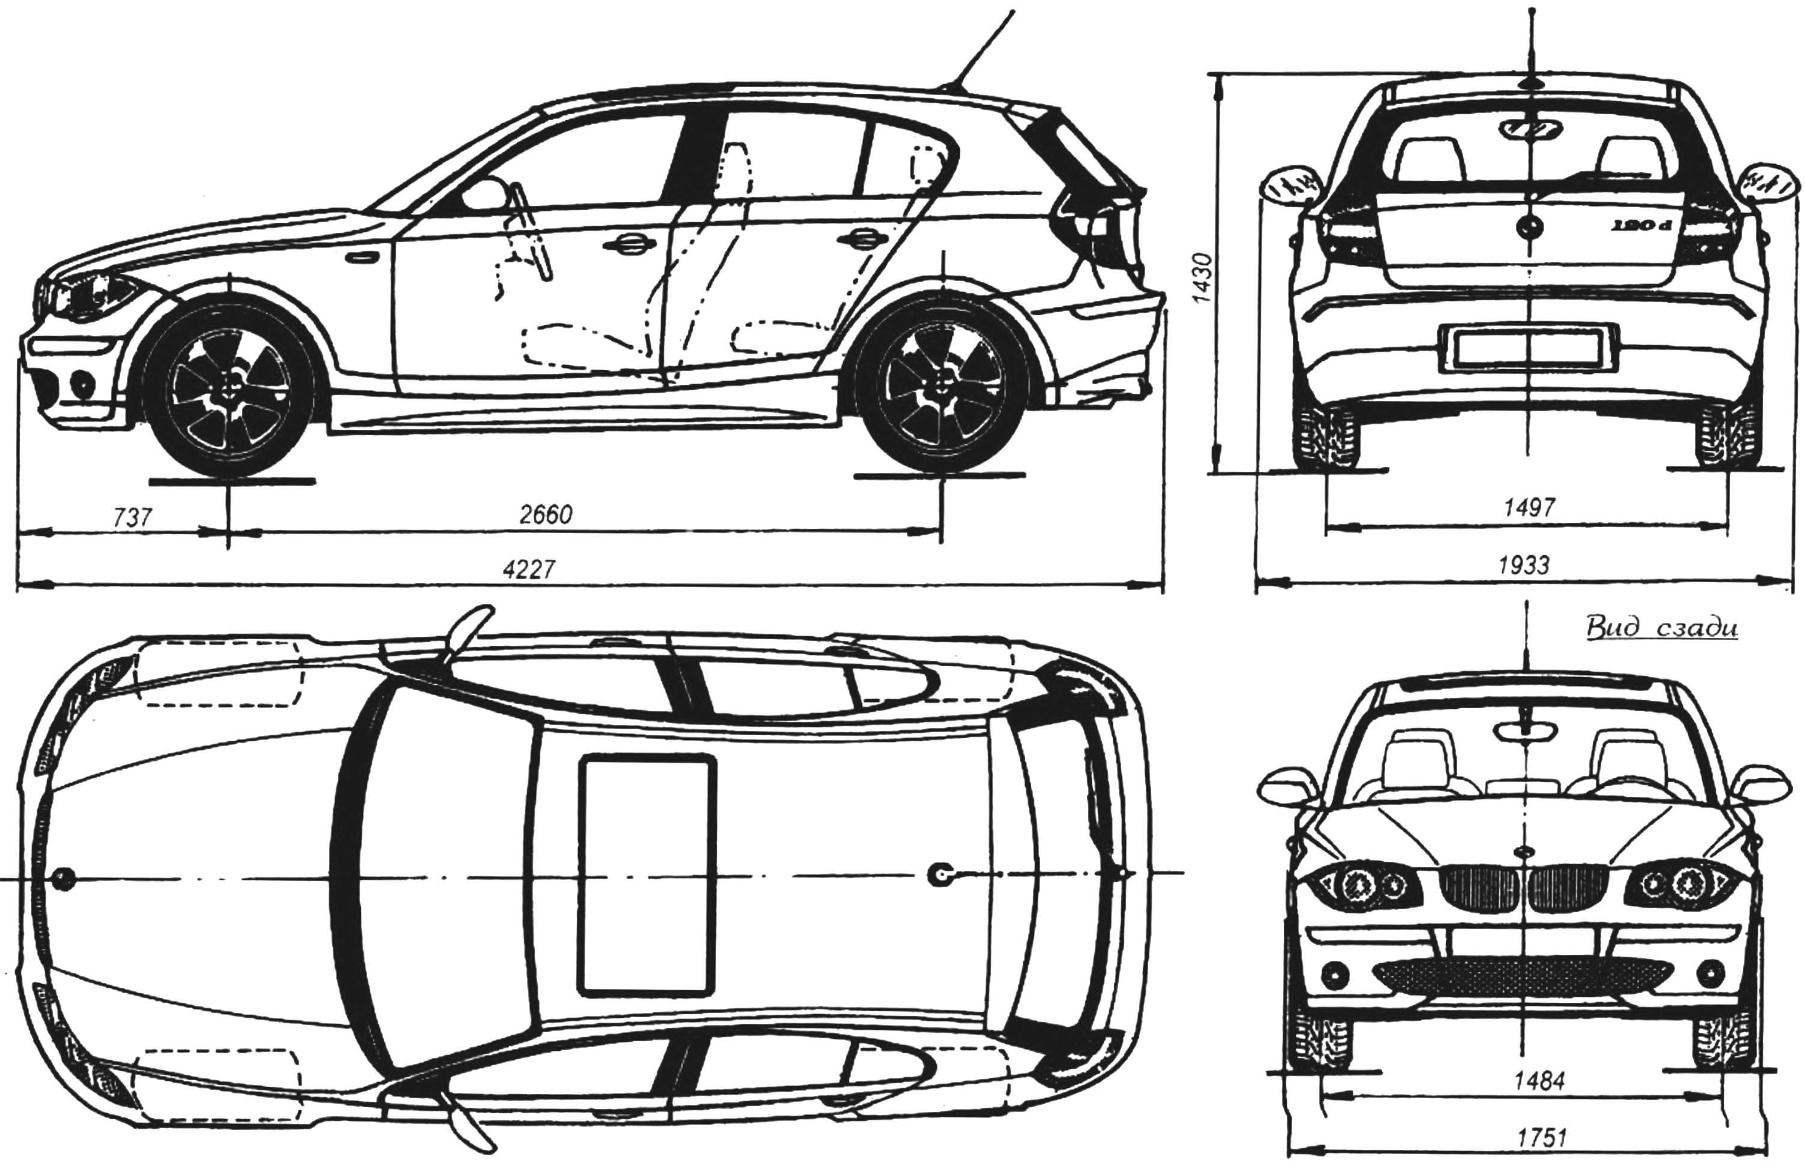 Geometric diagram of the BMW SERIES 1